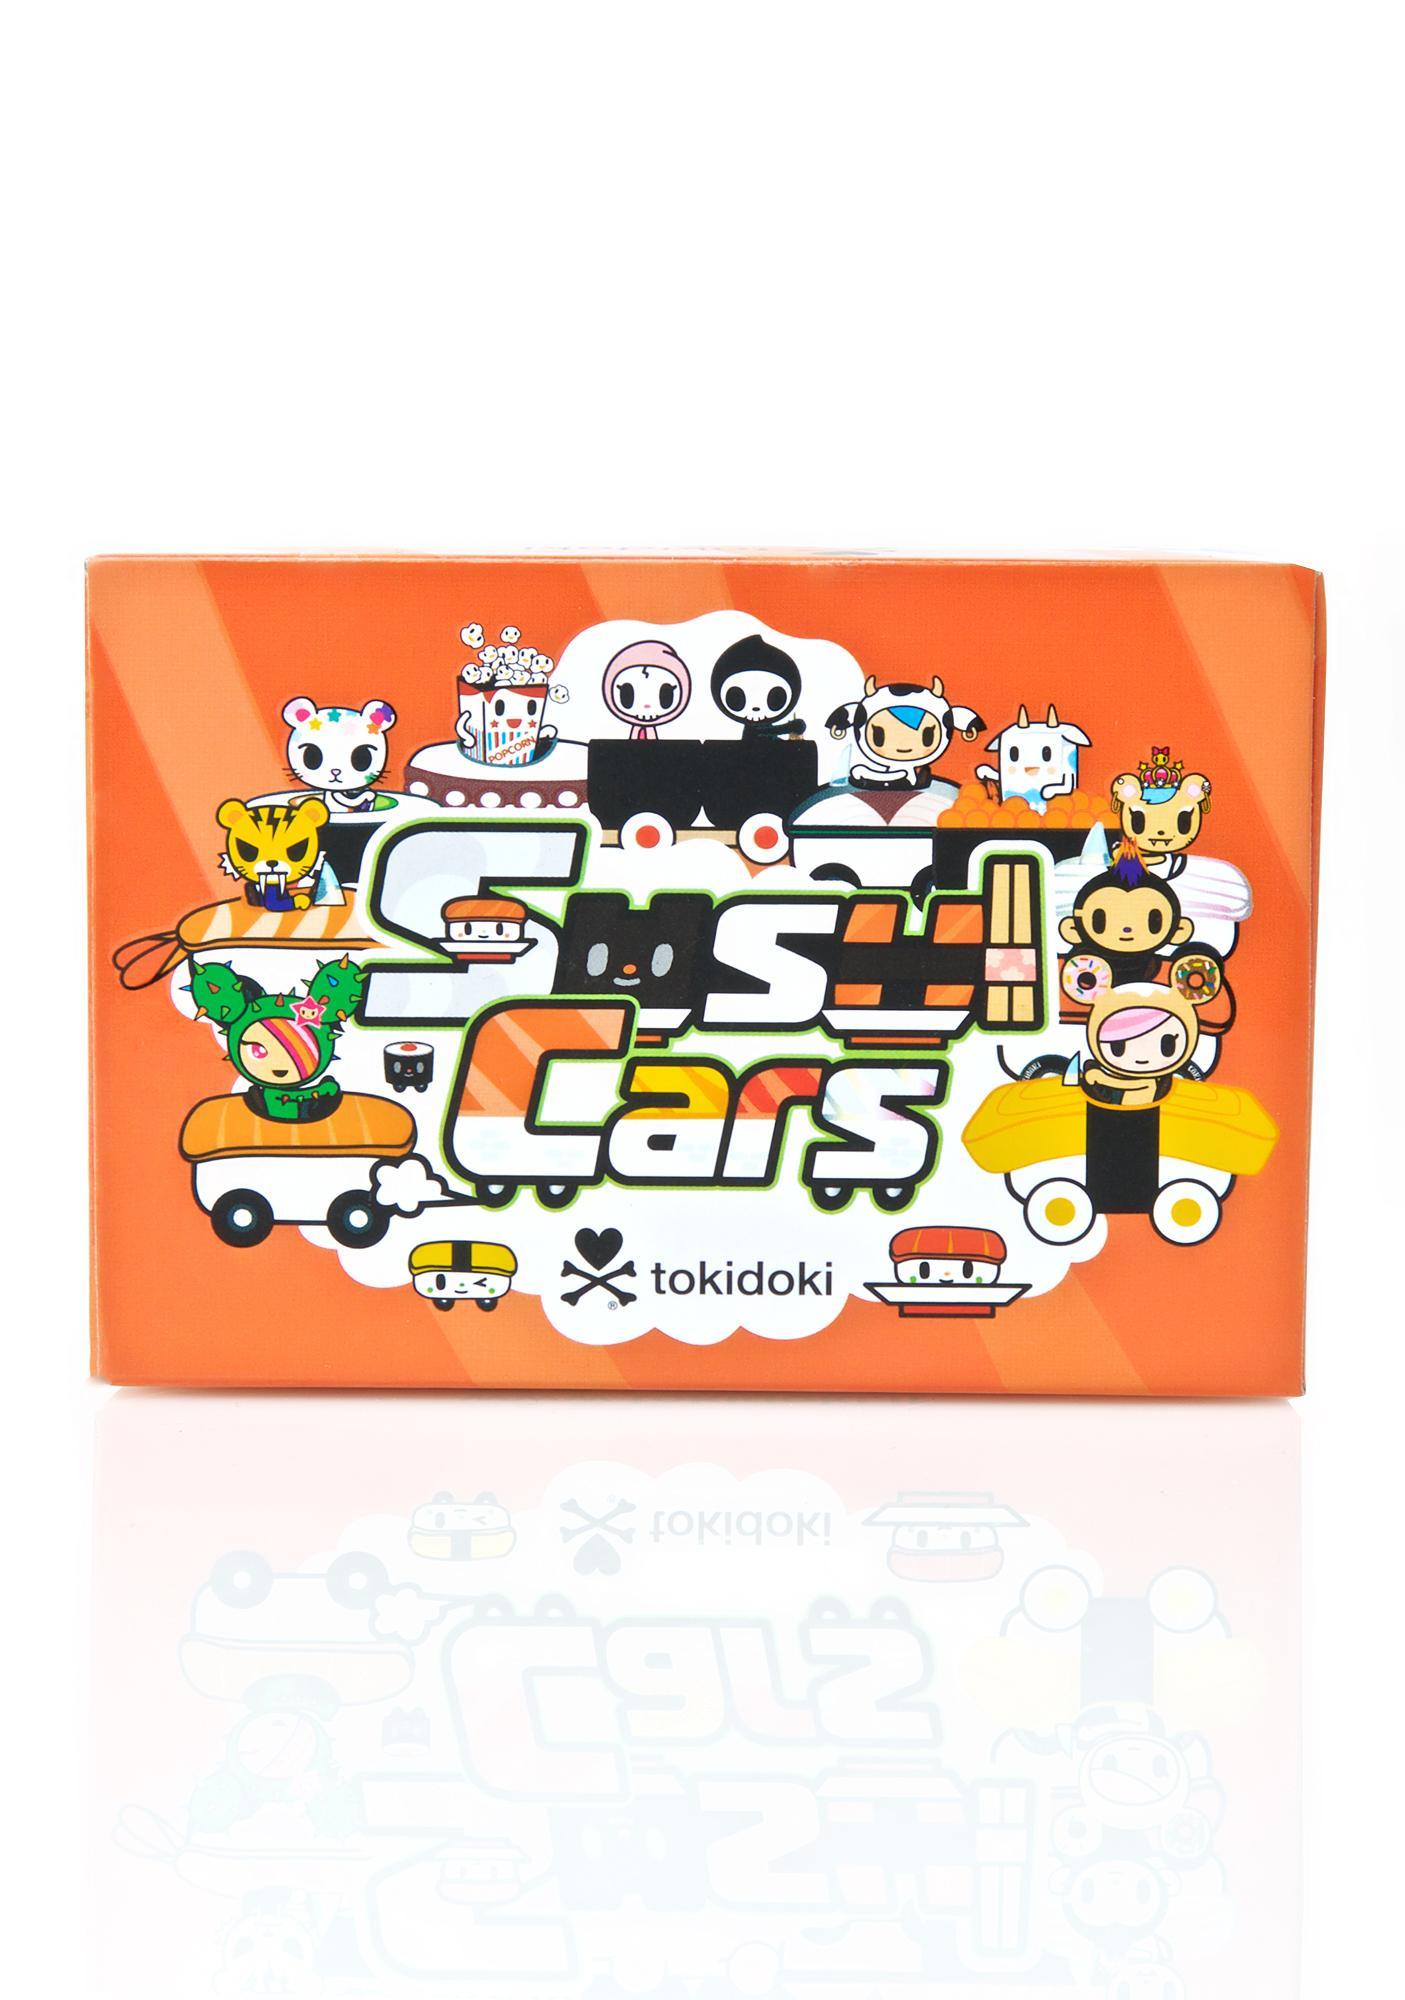 Tokidoki Sushi Cars Blind Box